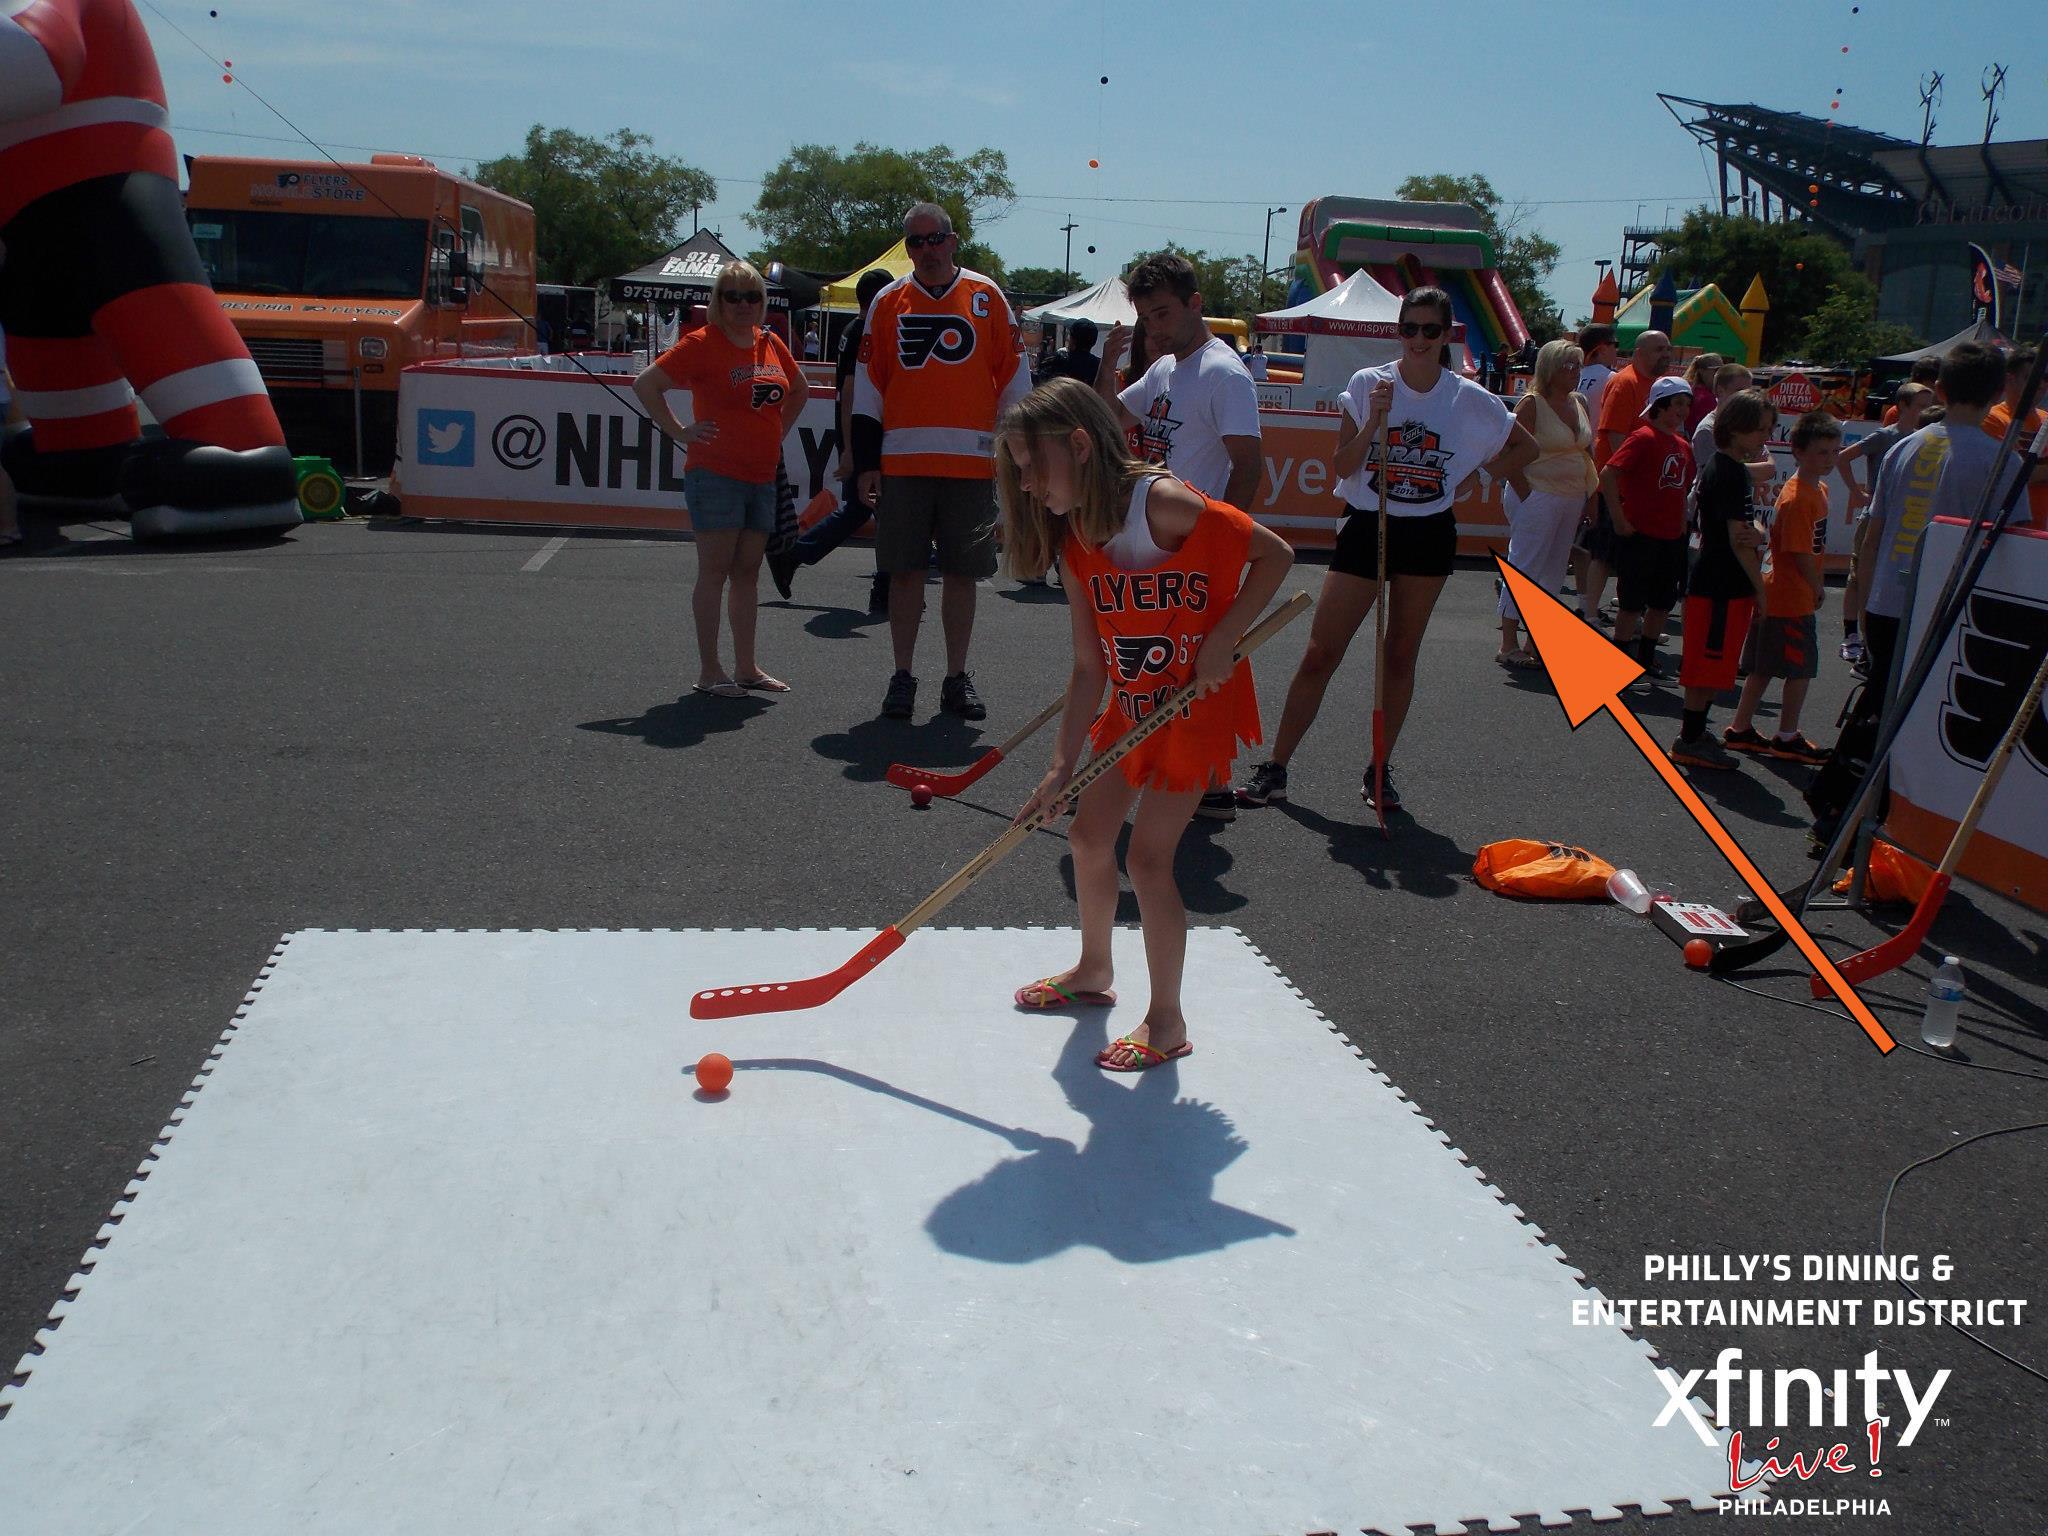 Me at NHL Draft Summer 2014 operating kids' hockey skills activity.